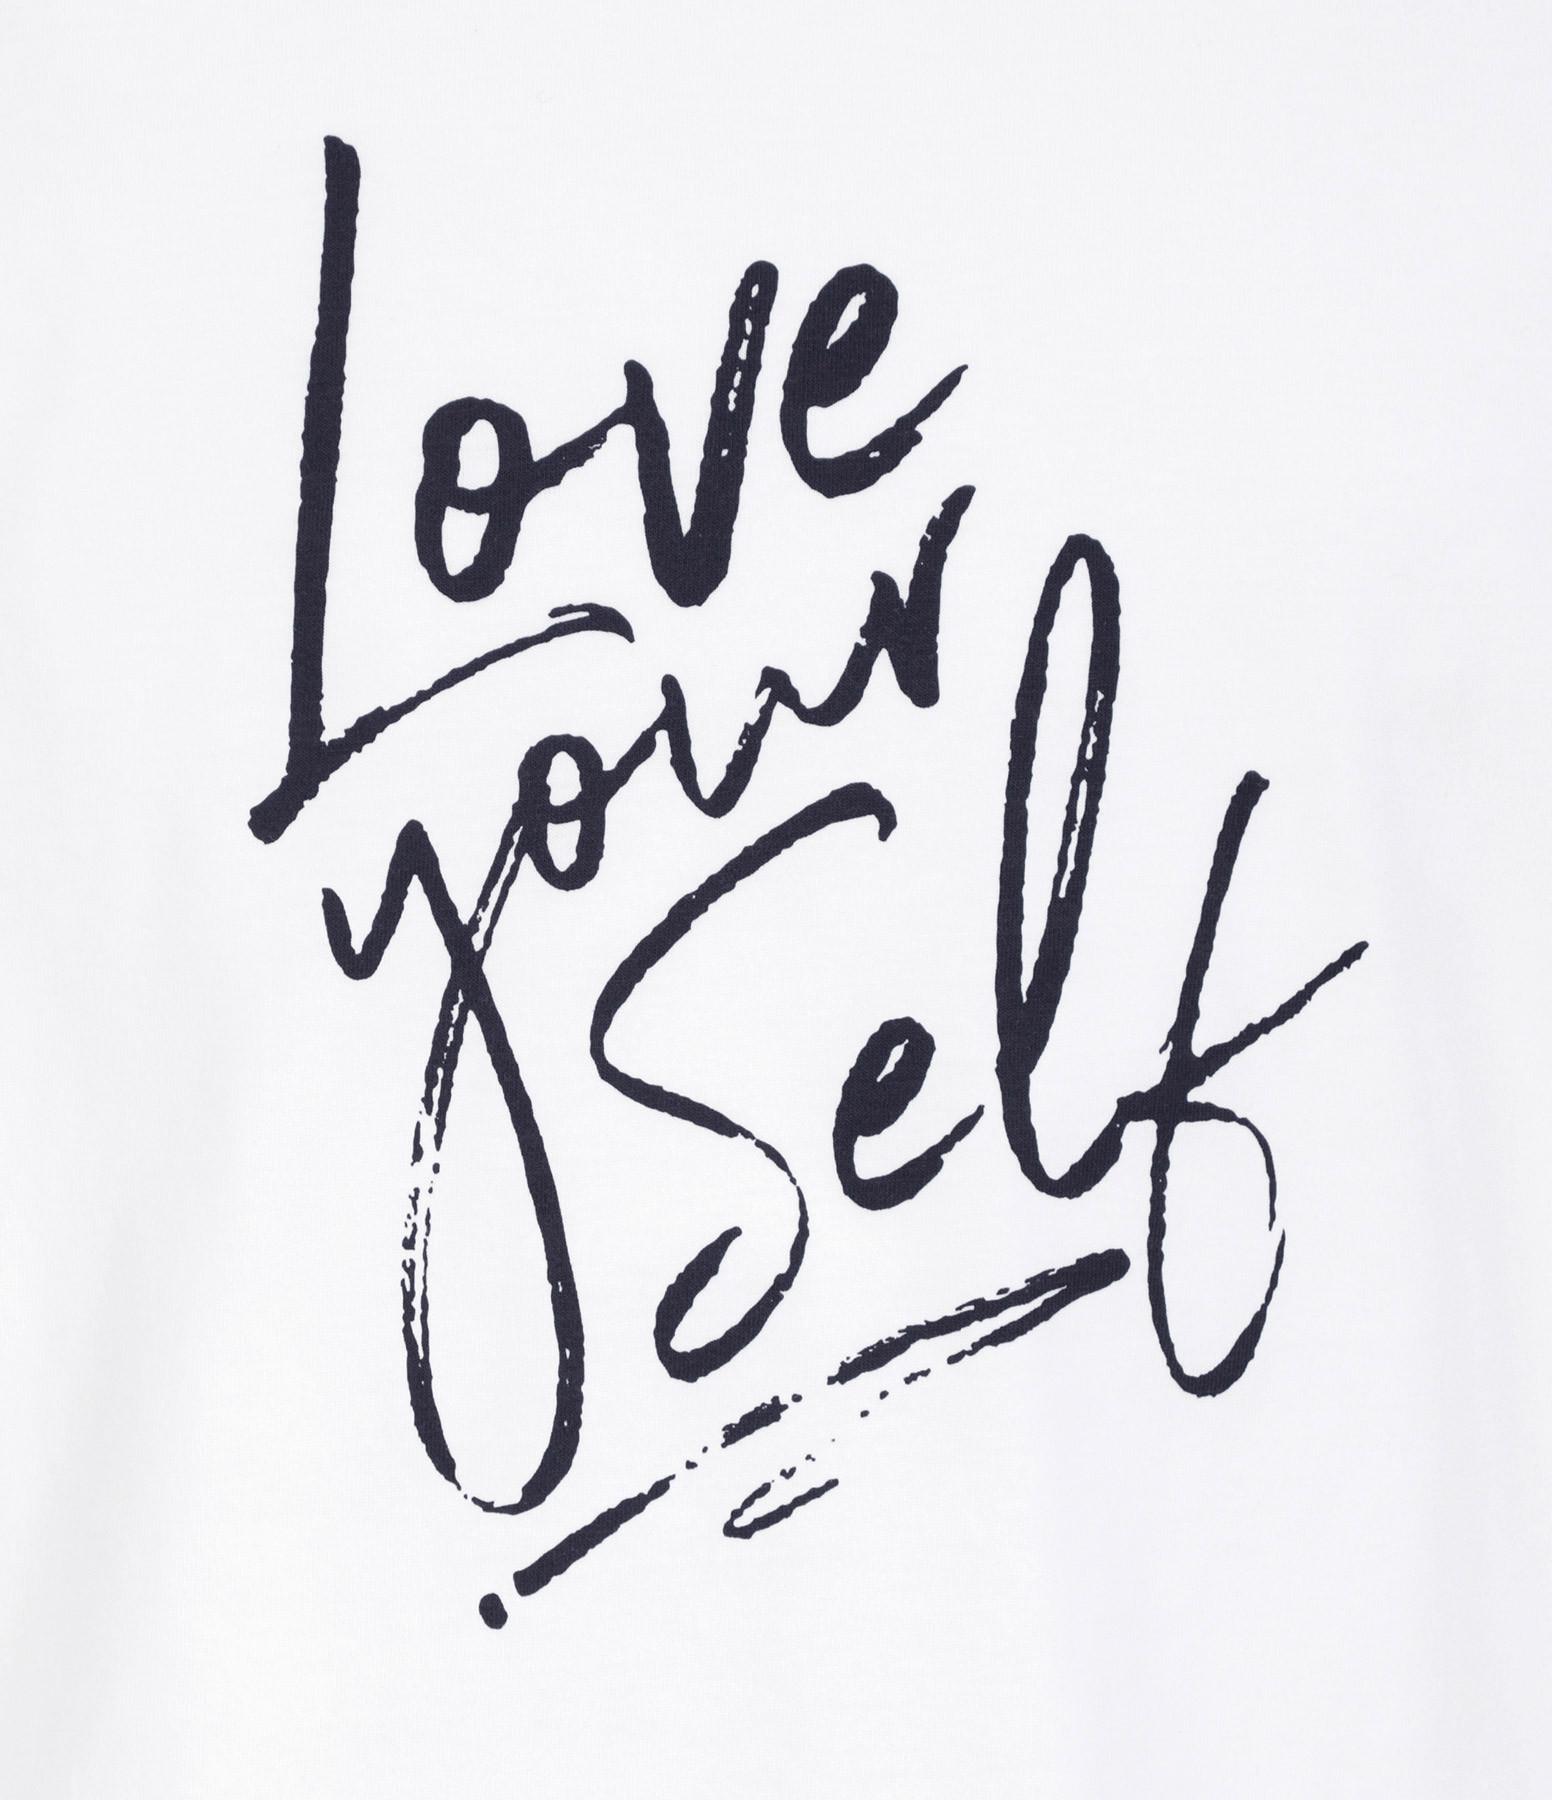 JEANNE VOULAND - Tee-shirt Fael Love Yourself Coton Biologique Blanc